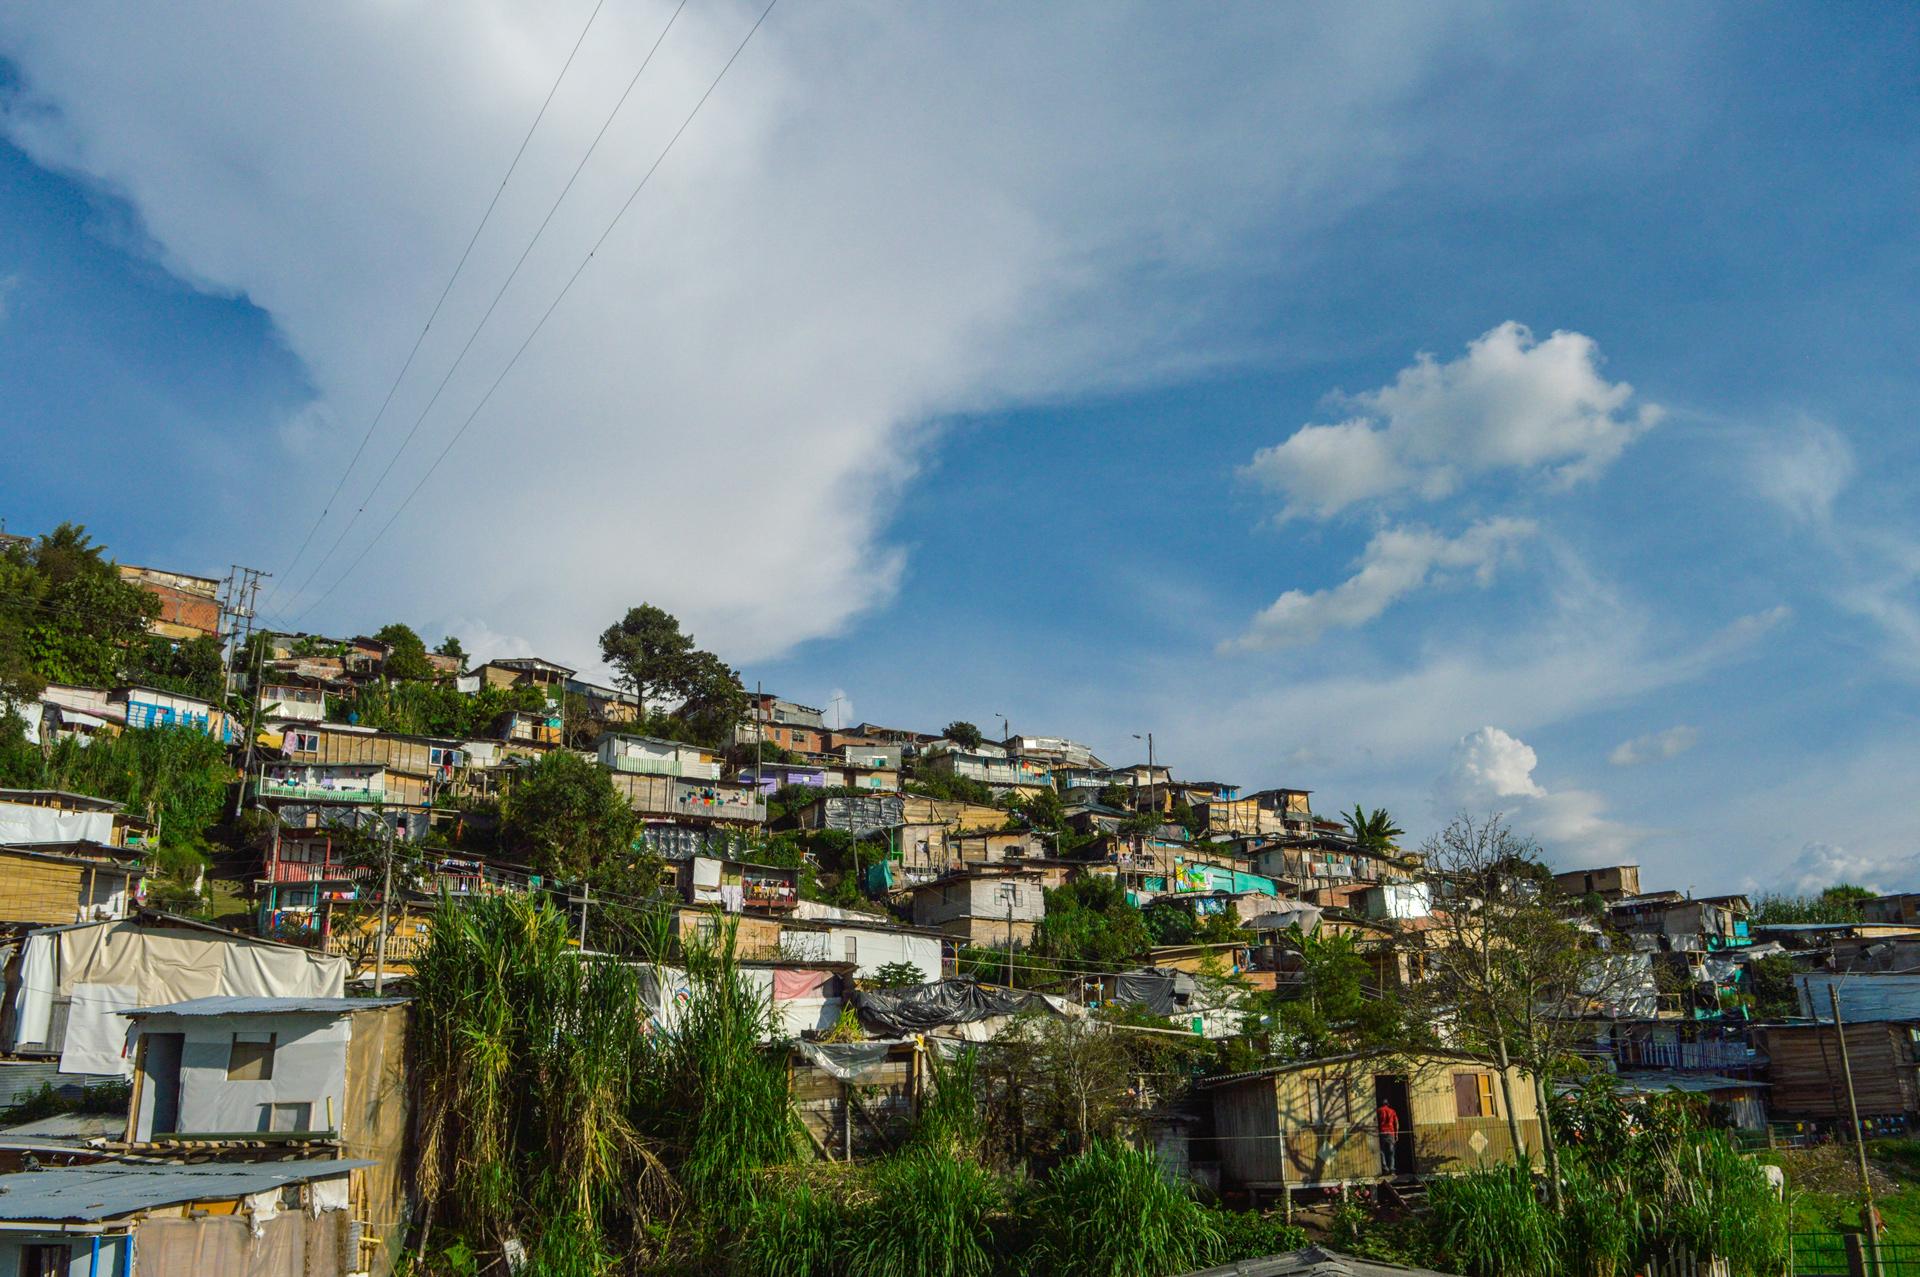 Barrio - Las Brisas - Pereira